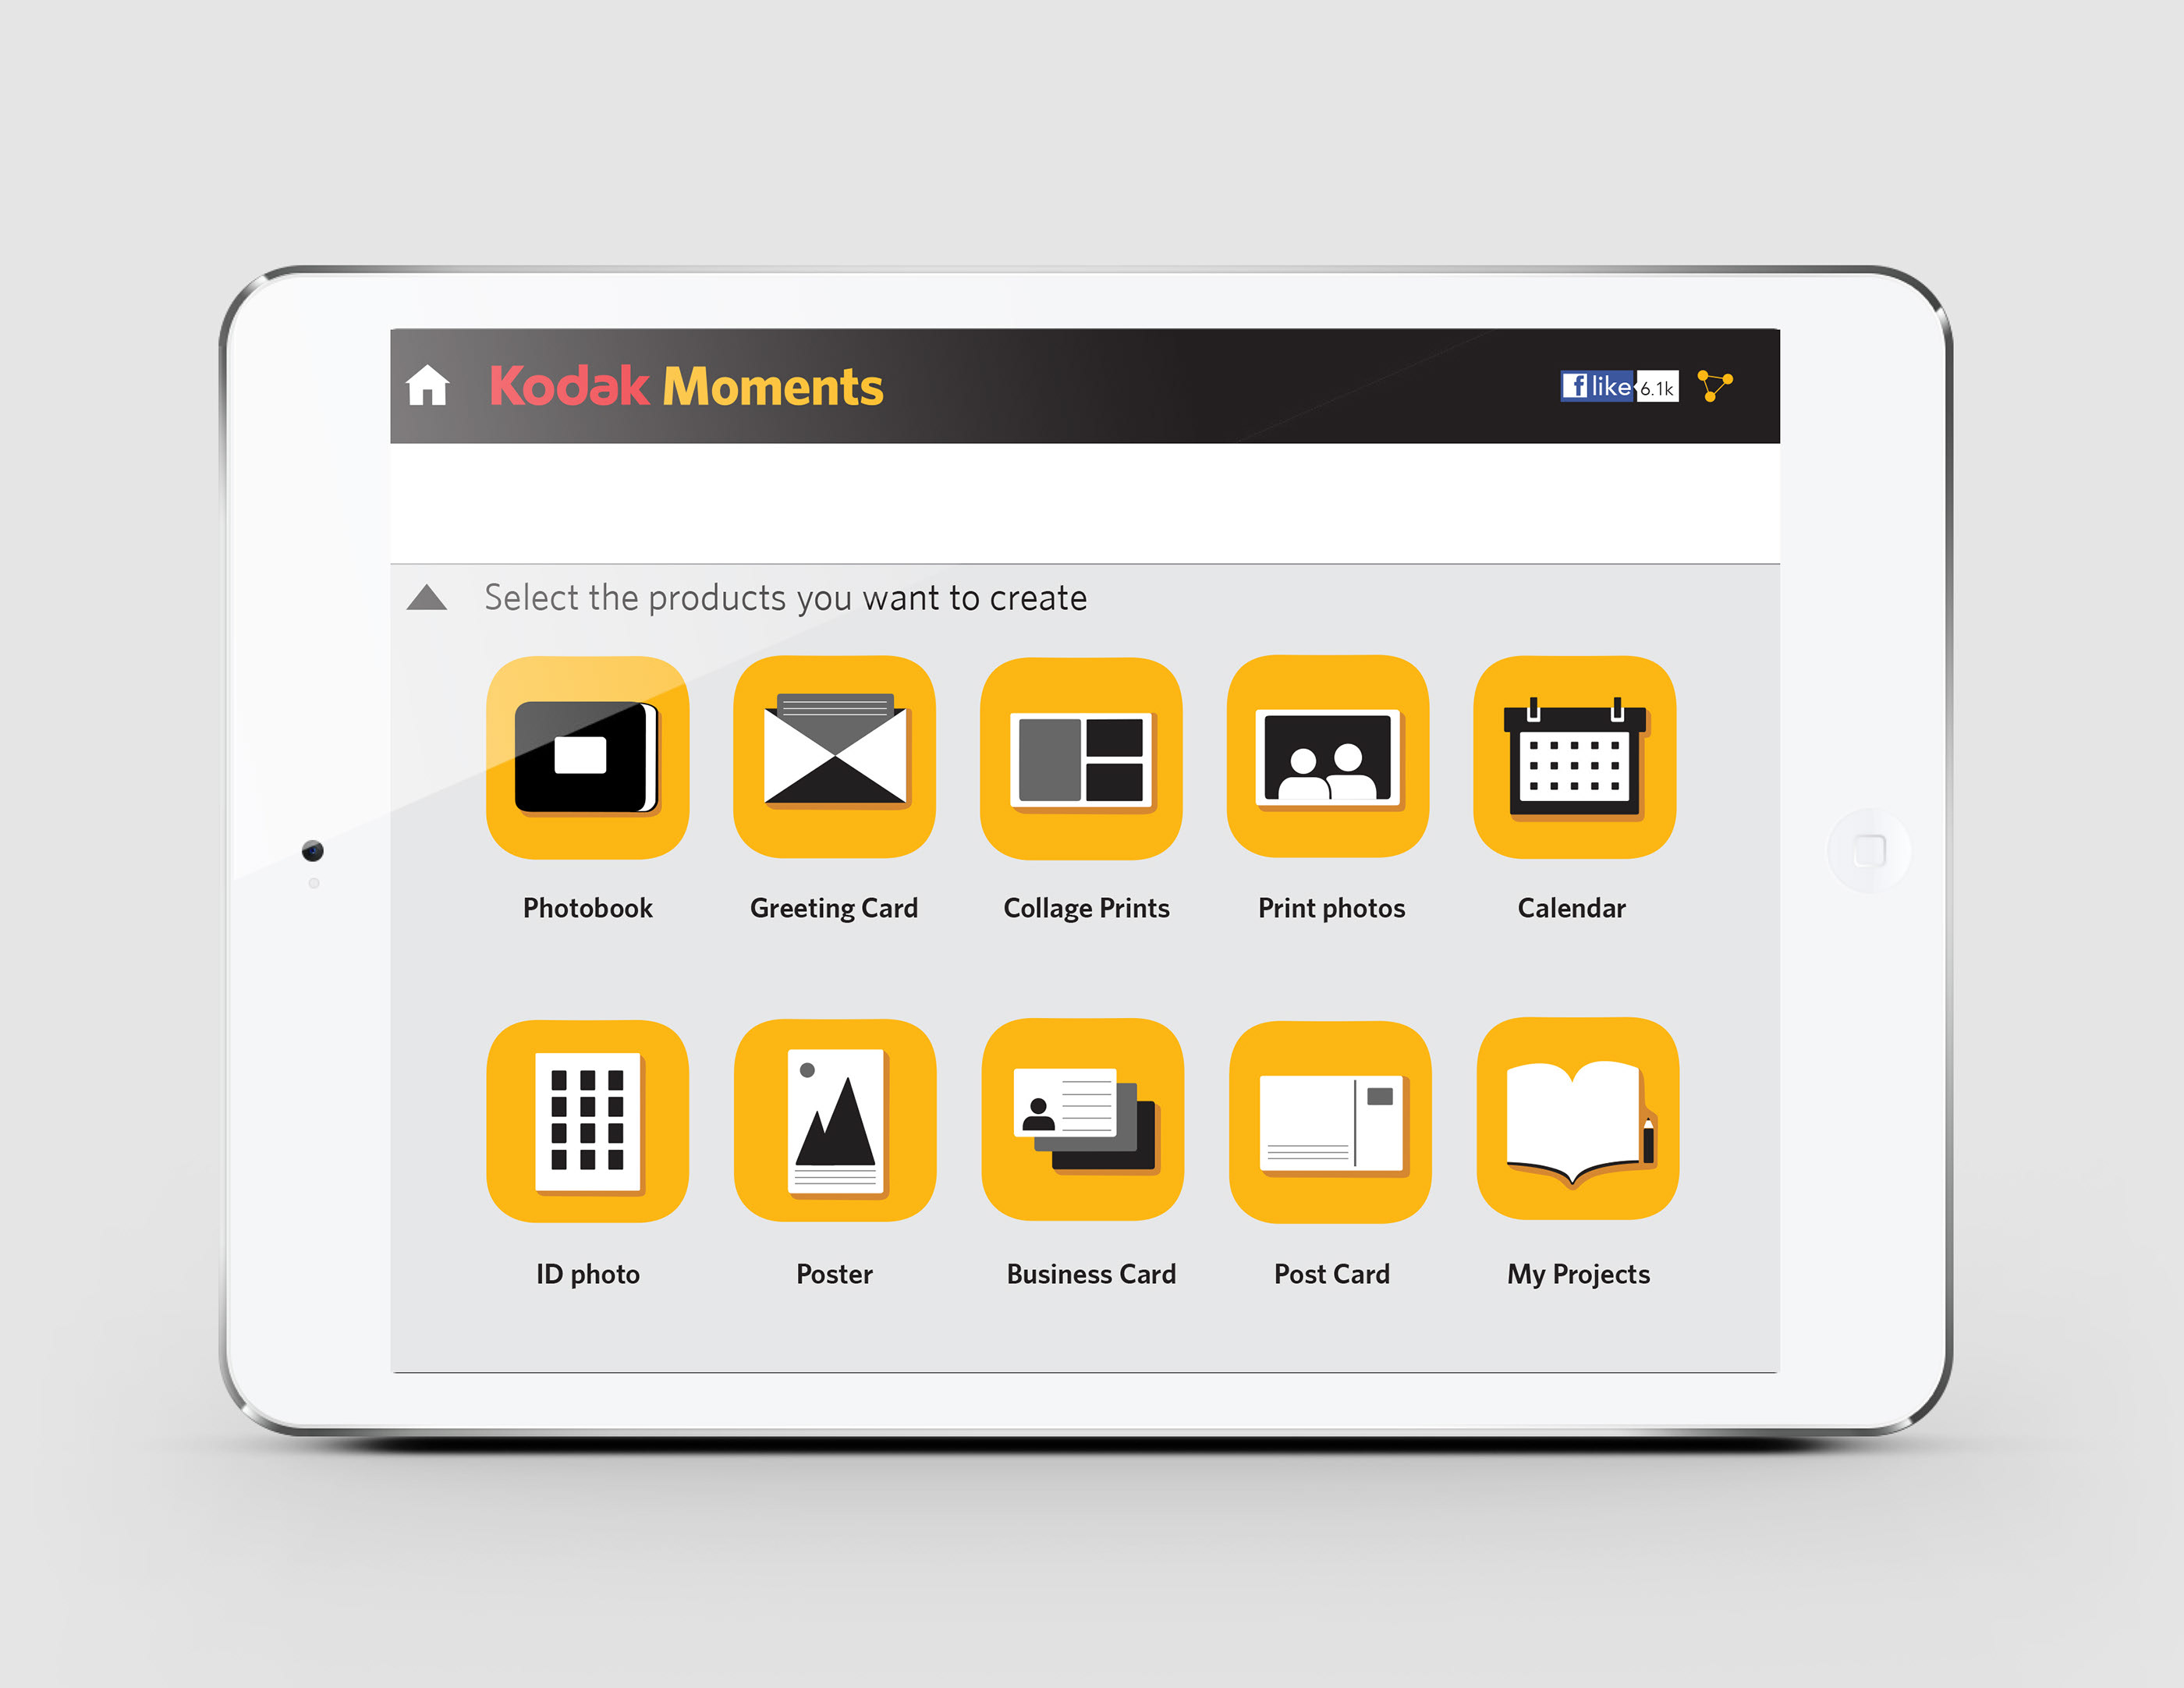 Kodak Moments App UI Design on Behance